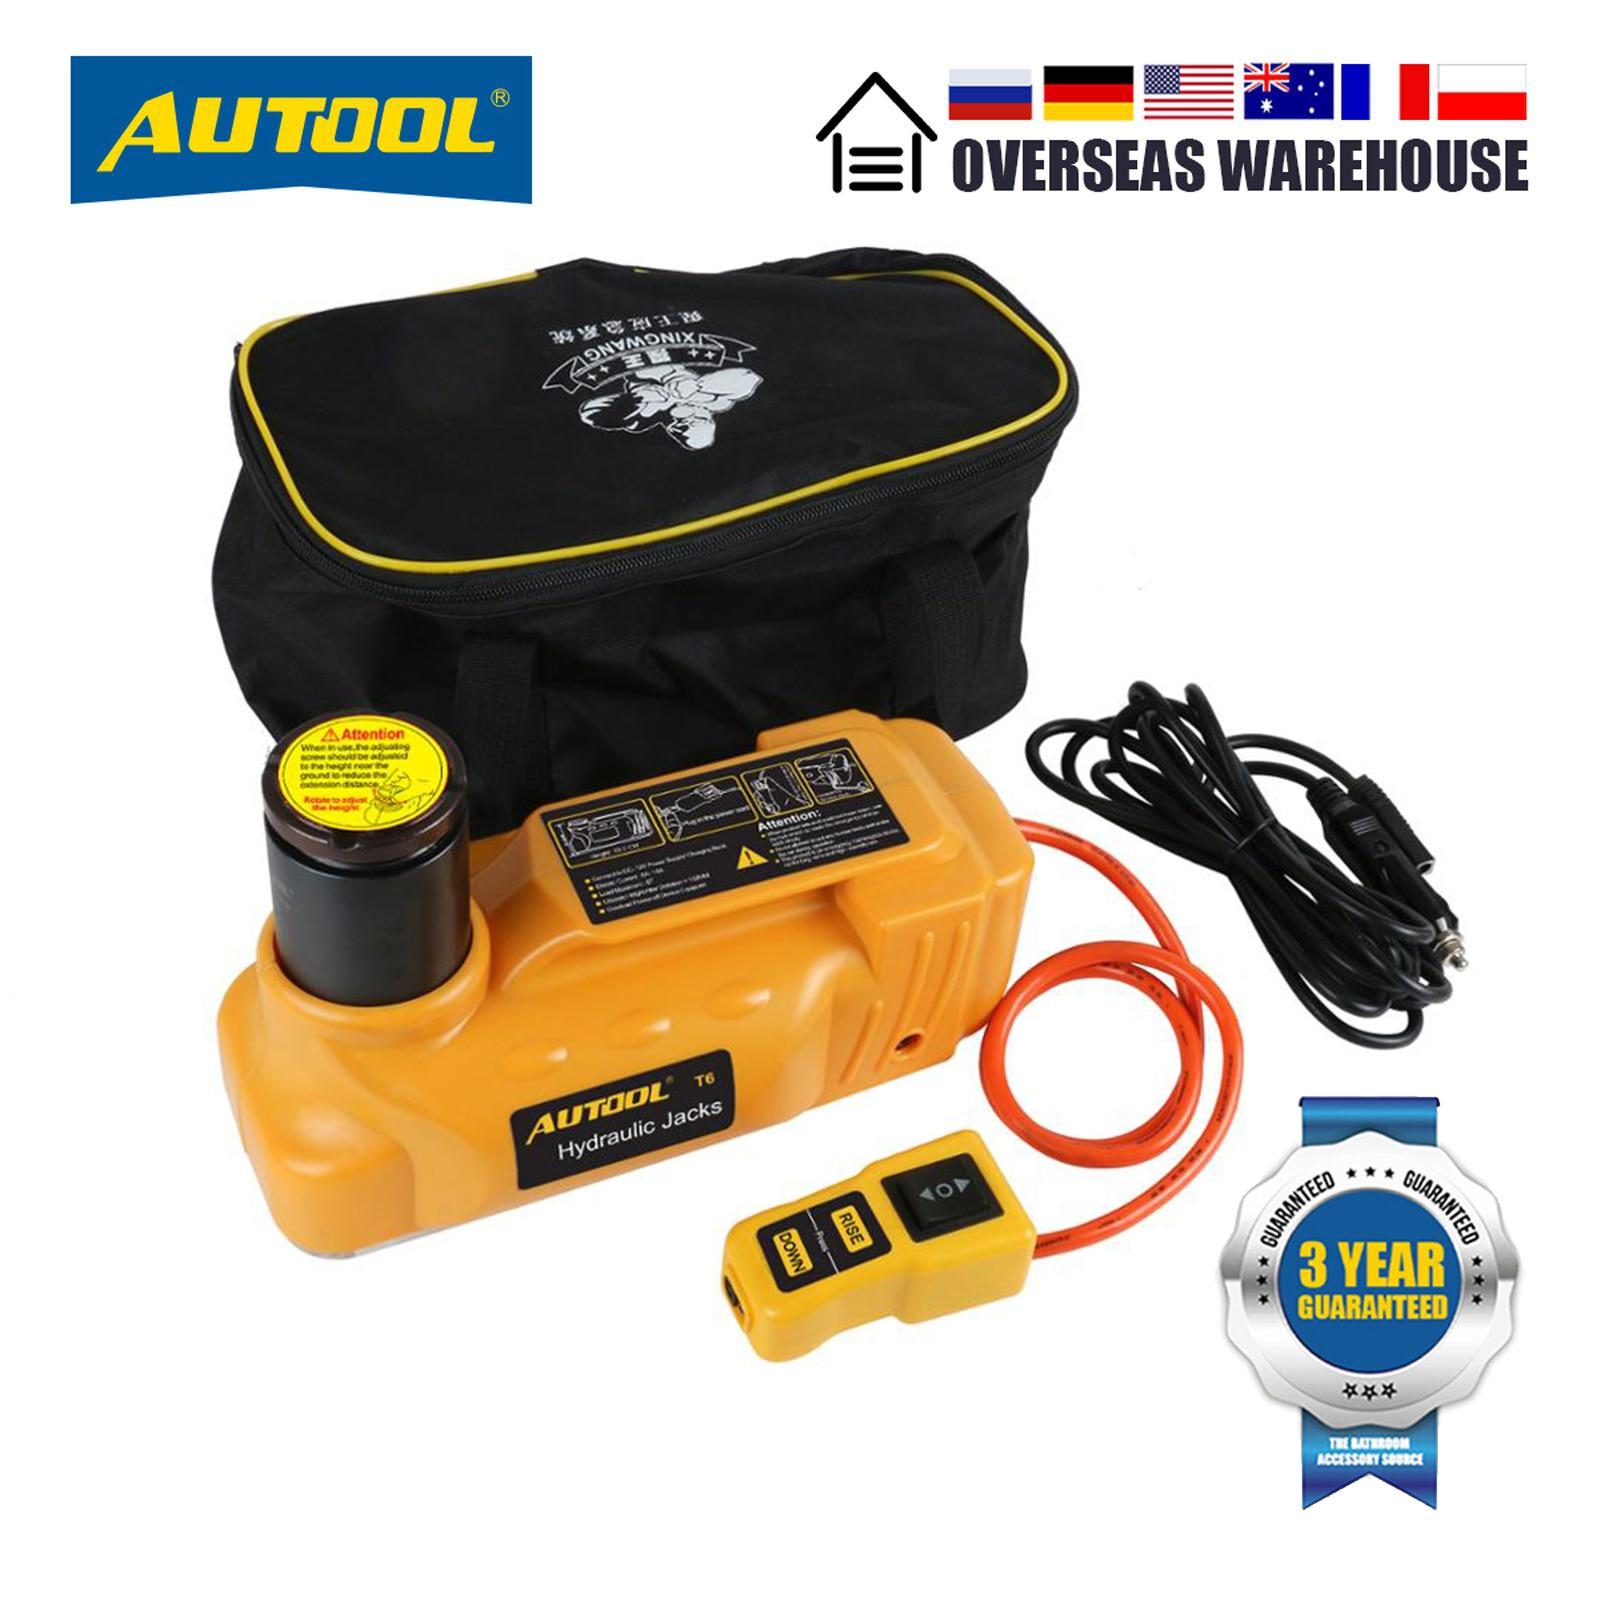 AUTOOL 6T Electric Hydraulic Jack Car Lifing  Automotive Roadside Emergency Tool Lifting  Jack  12V Portable Floor Tool Jack Kit